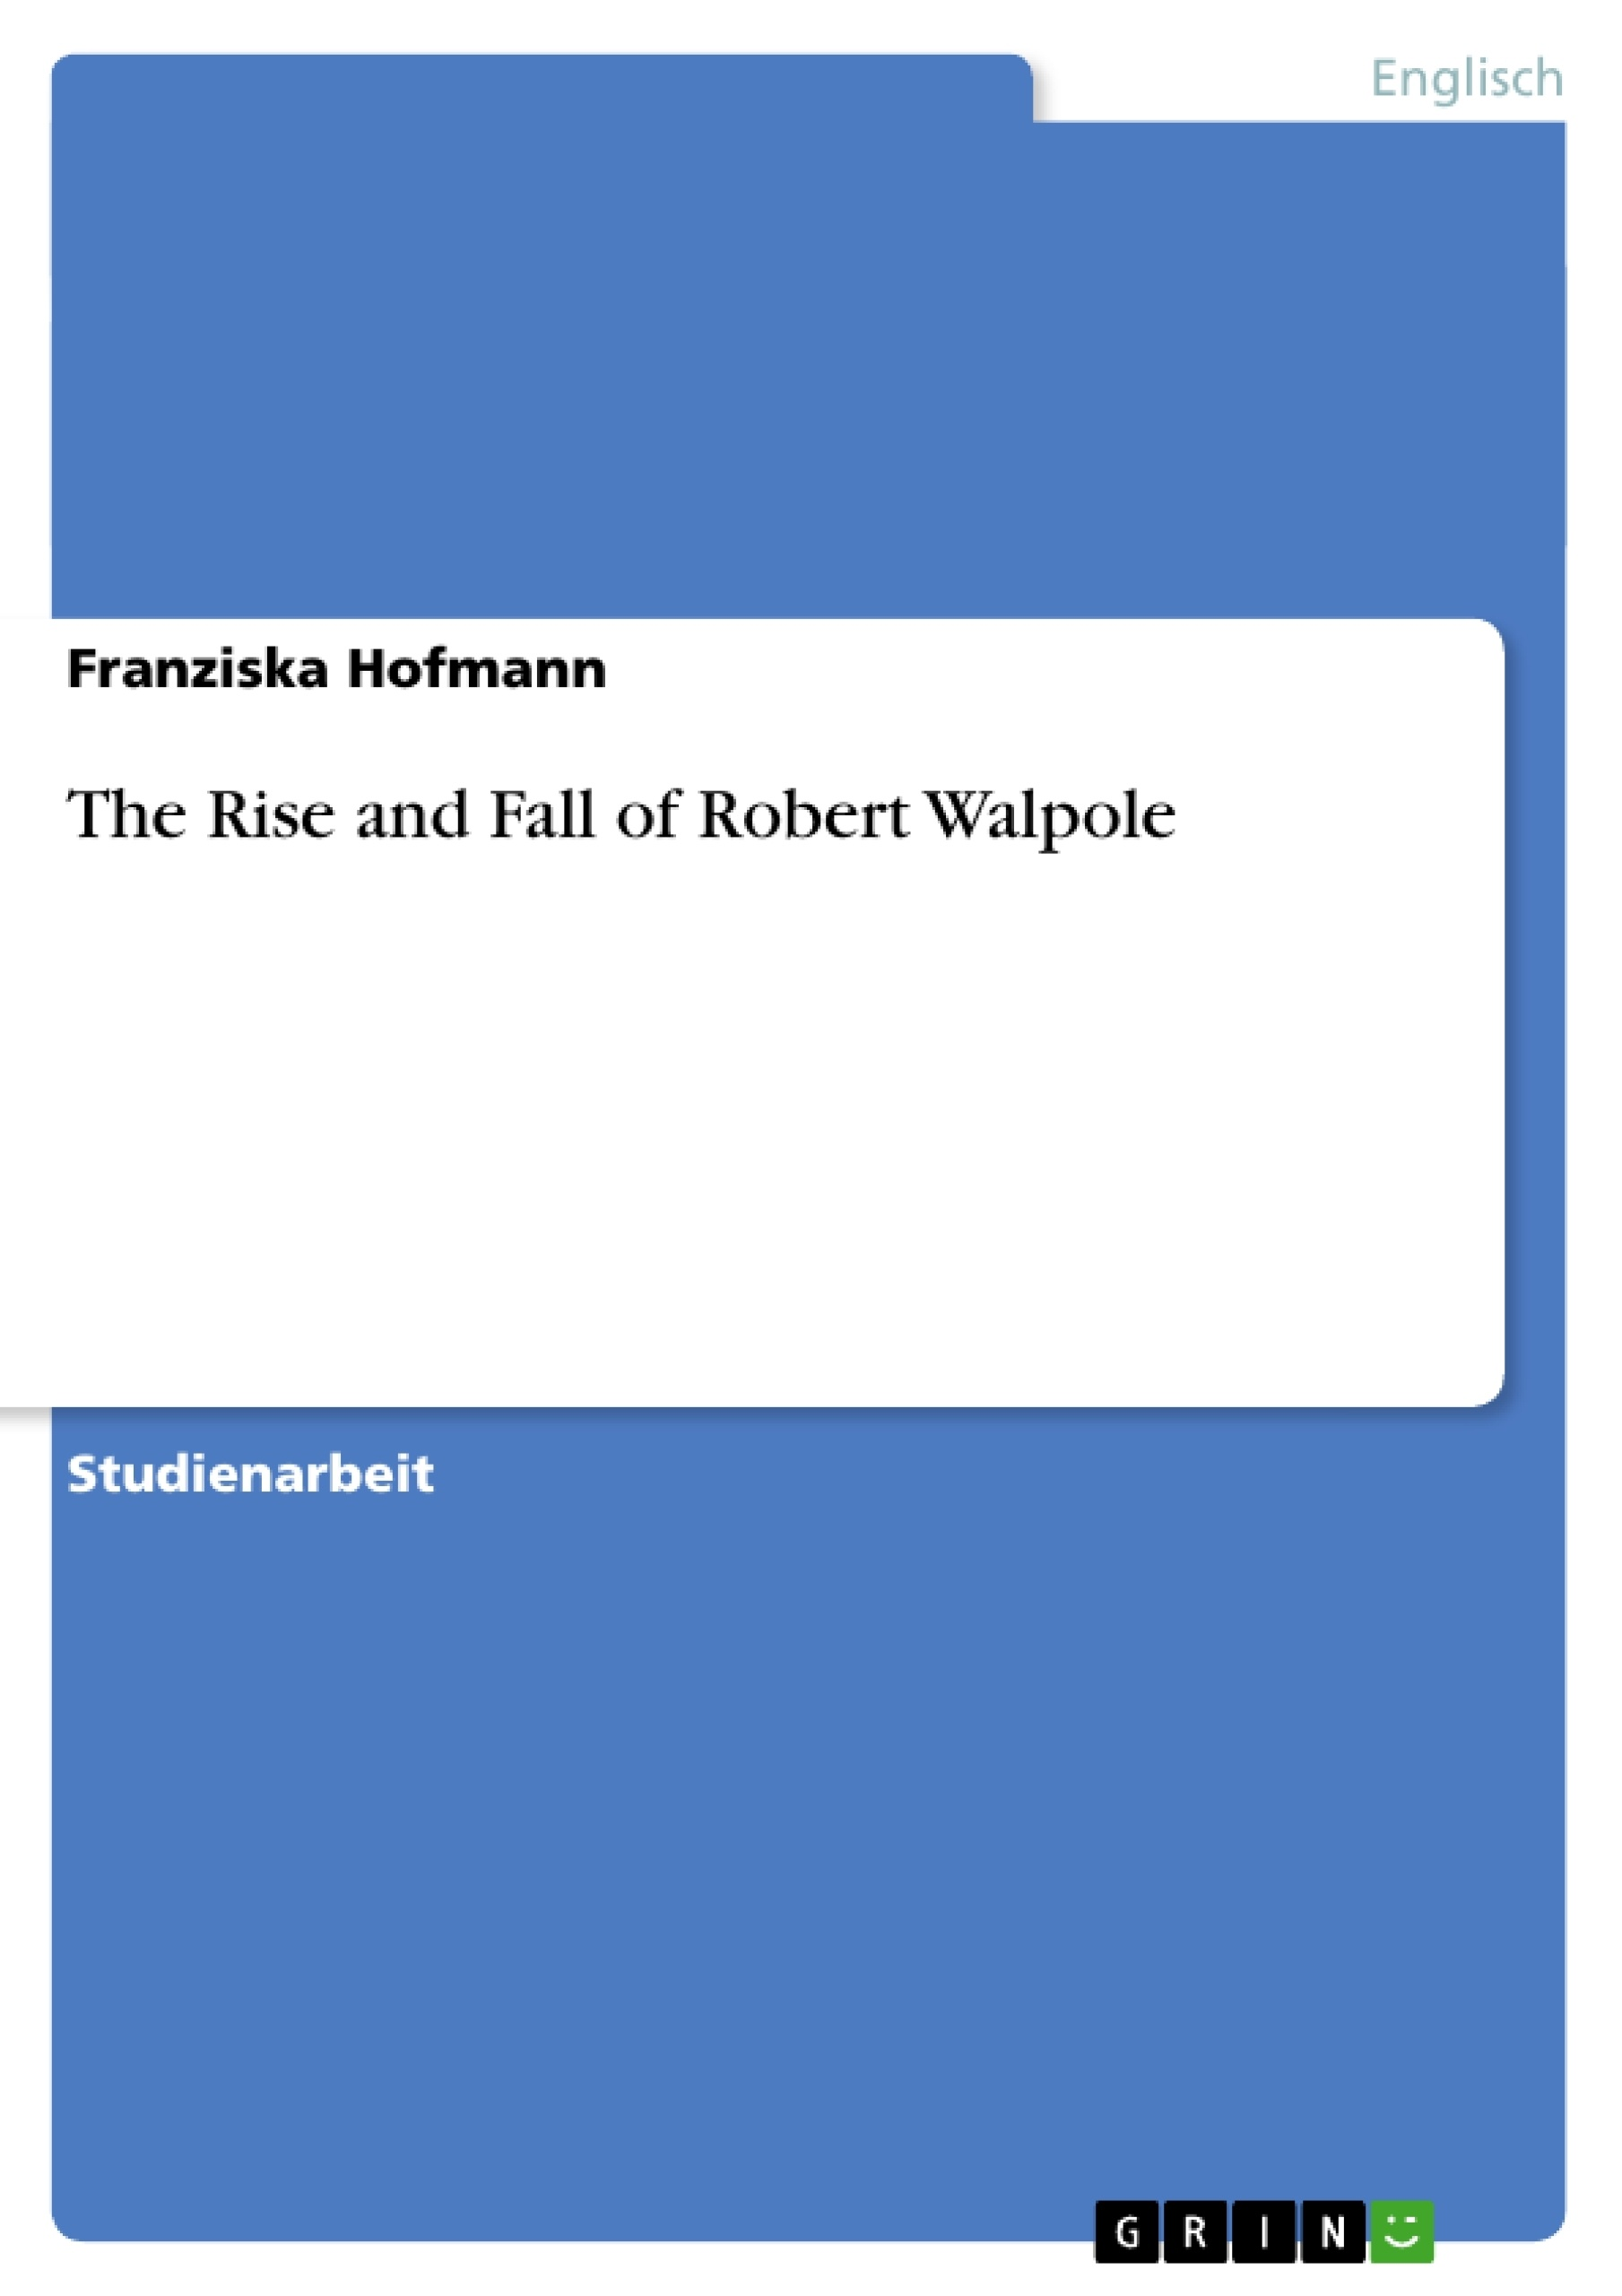 The Rise and Fall of Robert Walpole | Masterarbeit, Hausarbeit ...